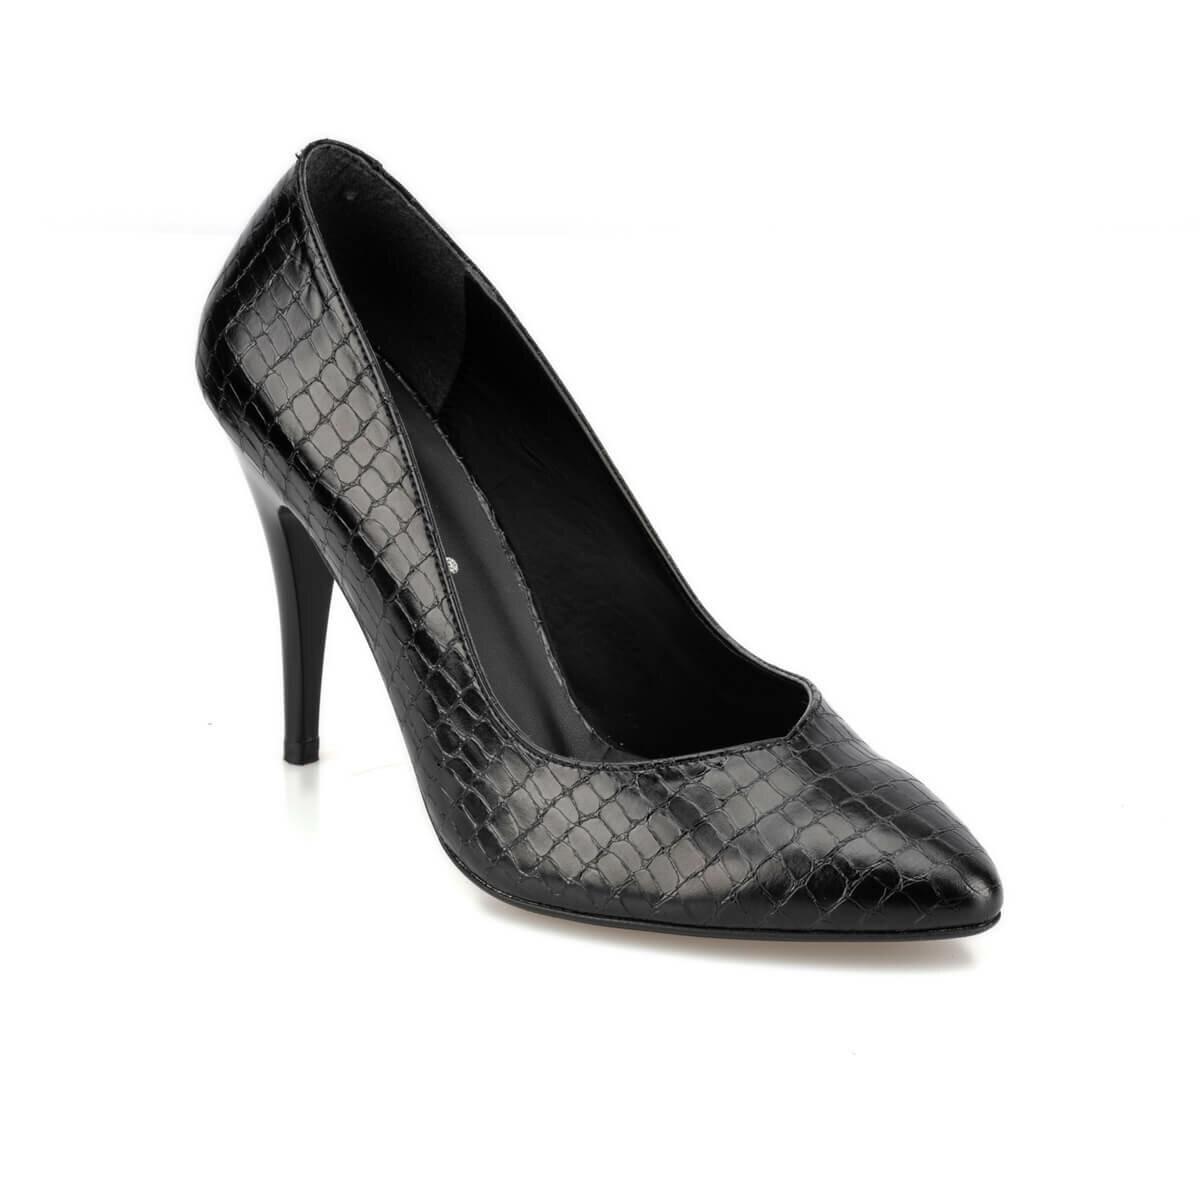 FLO 92.314118.Z Black Women Gova Shoes Polaris